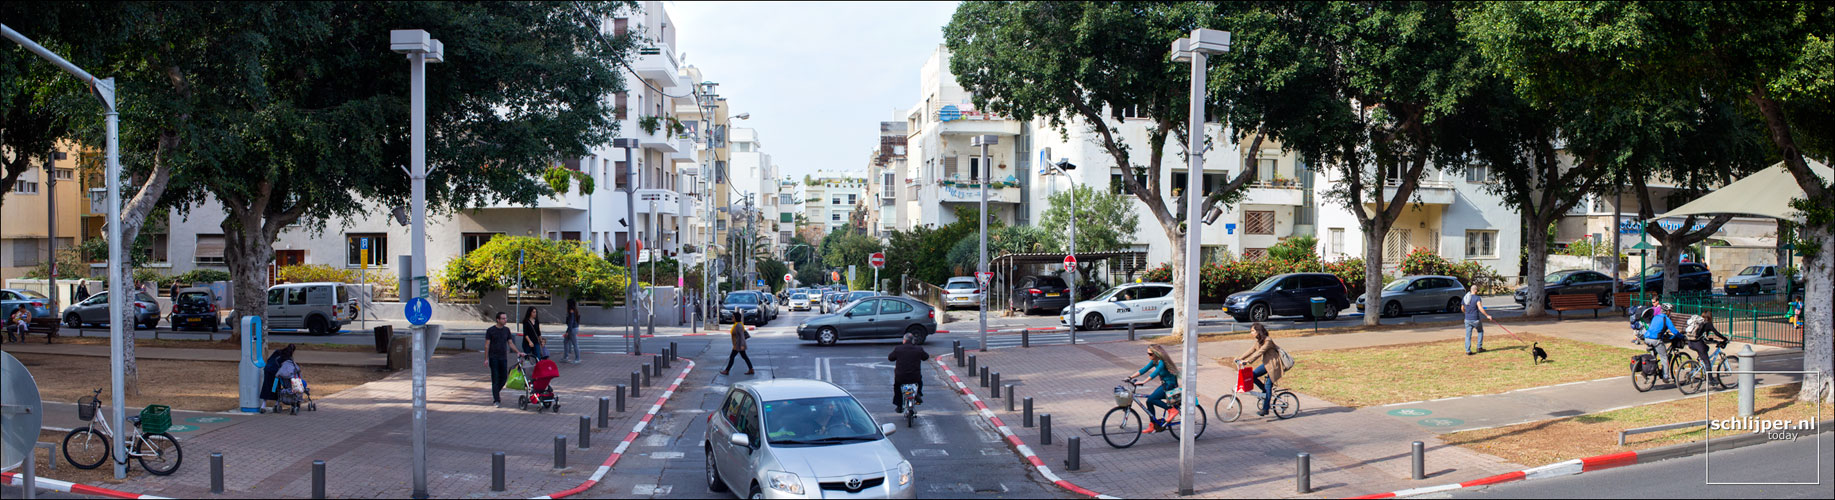 Israel, Tel Aviv, 3 januari 2014